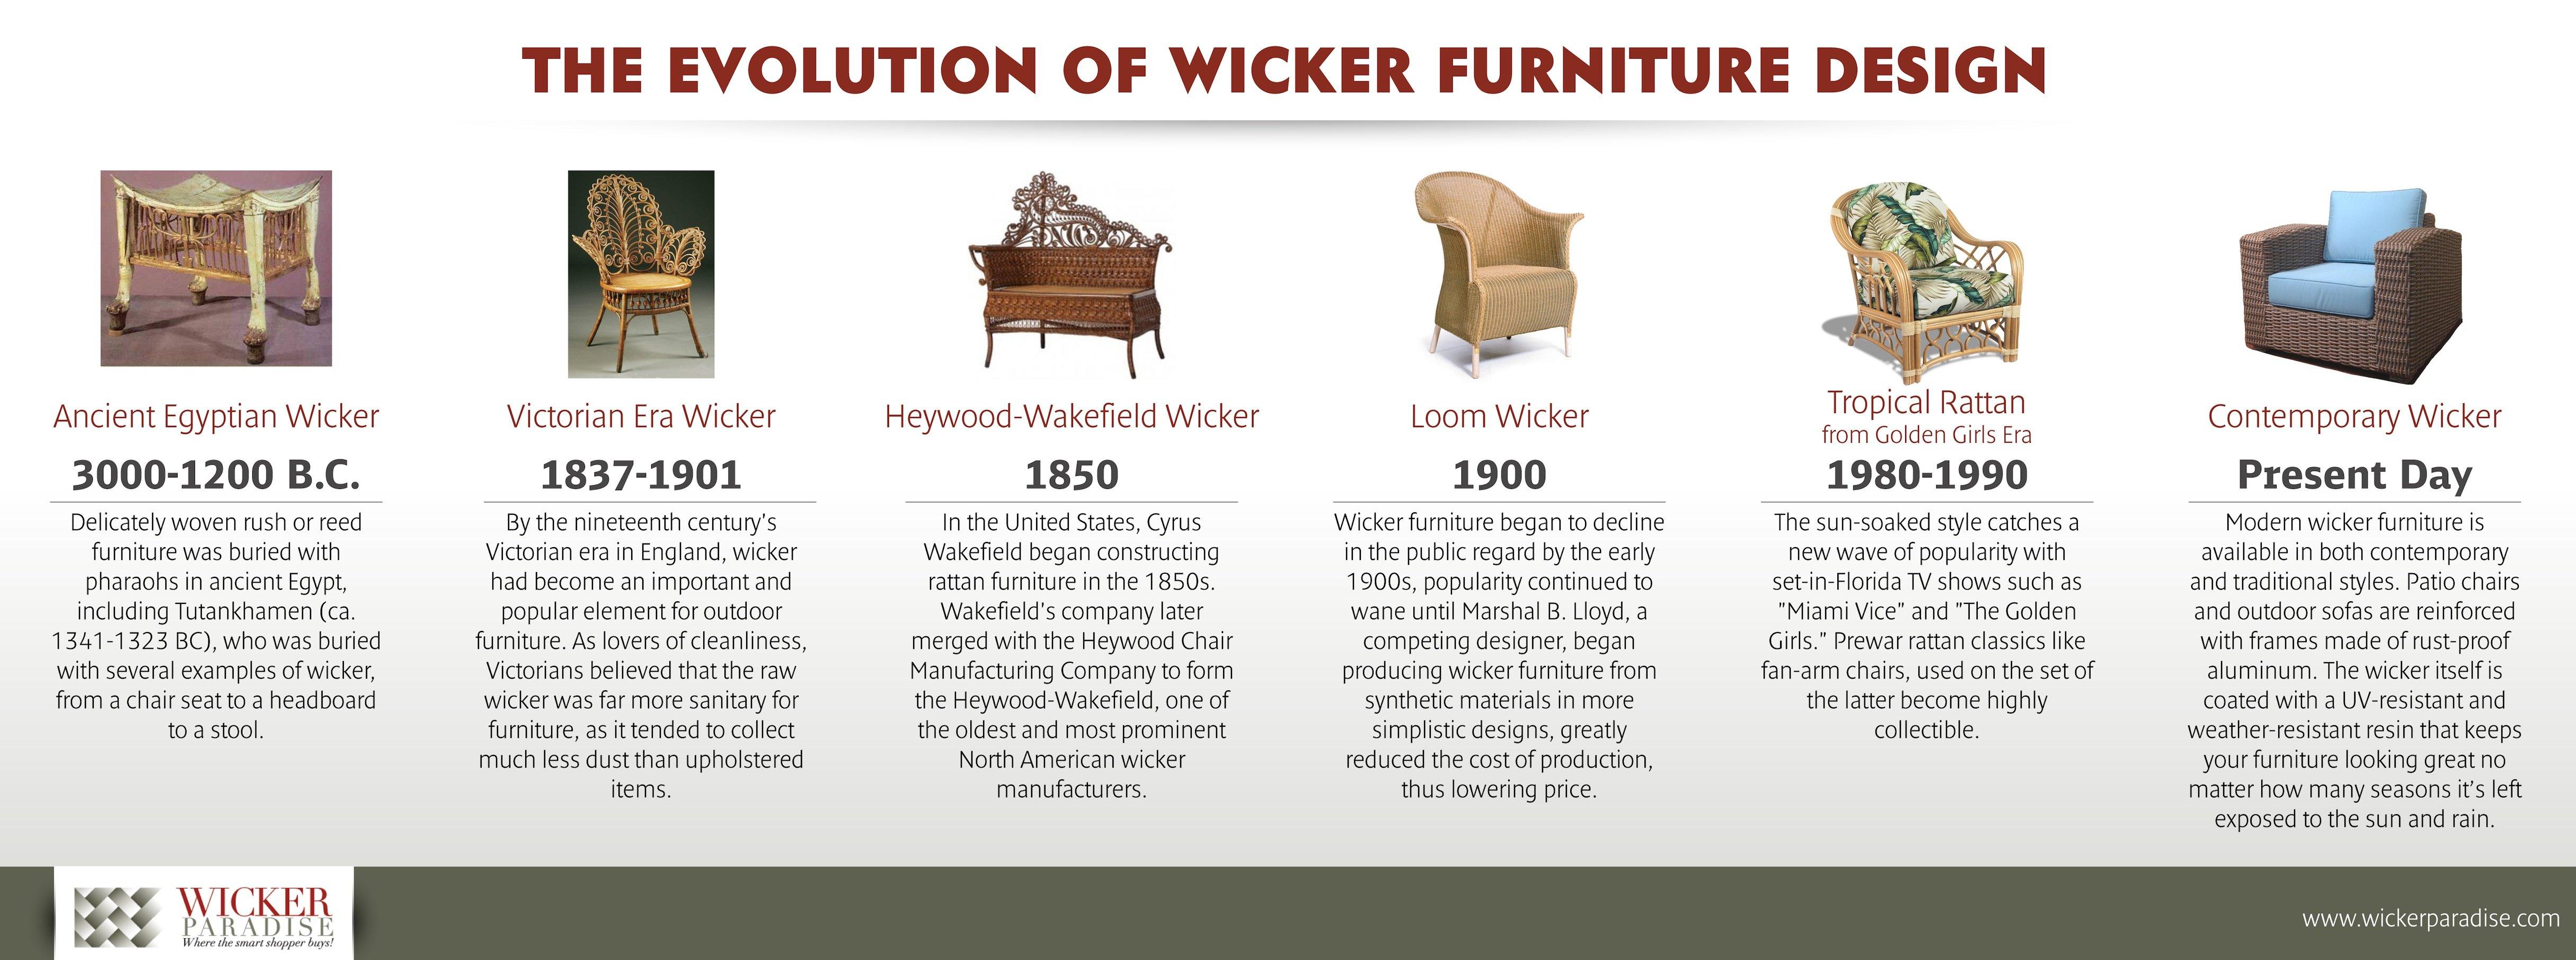 Eveloution of wicker design.jpg